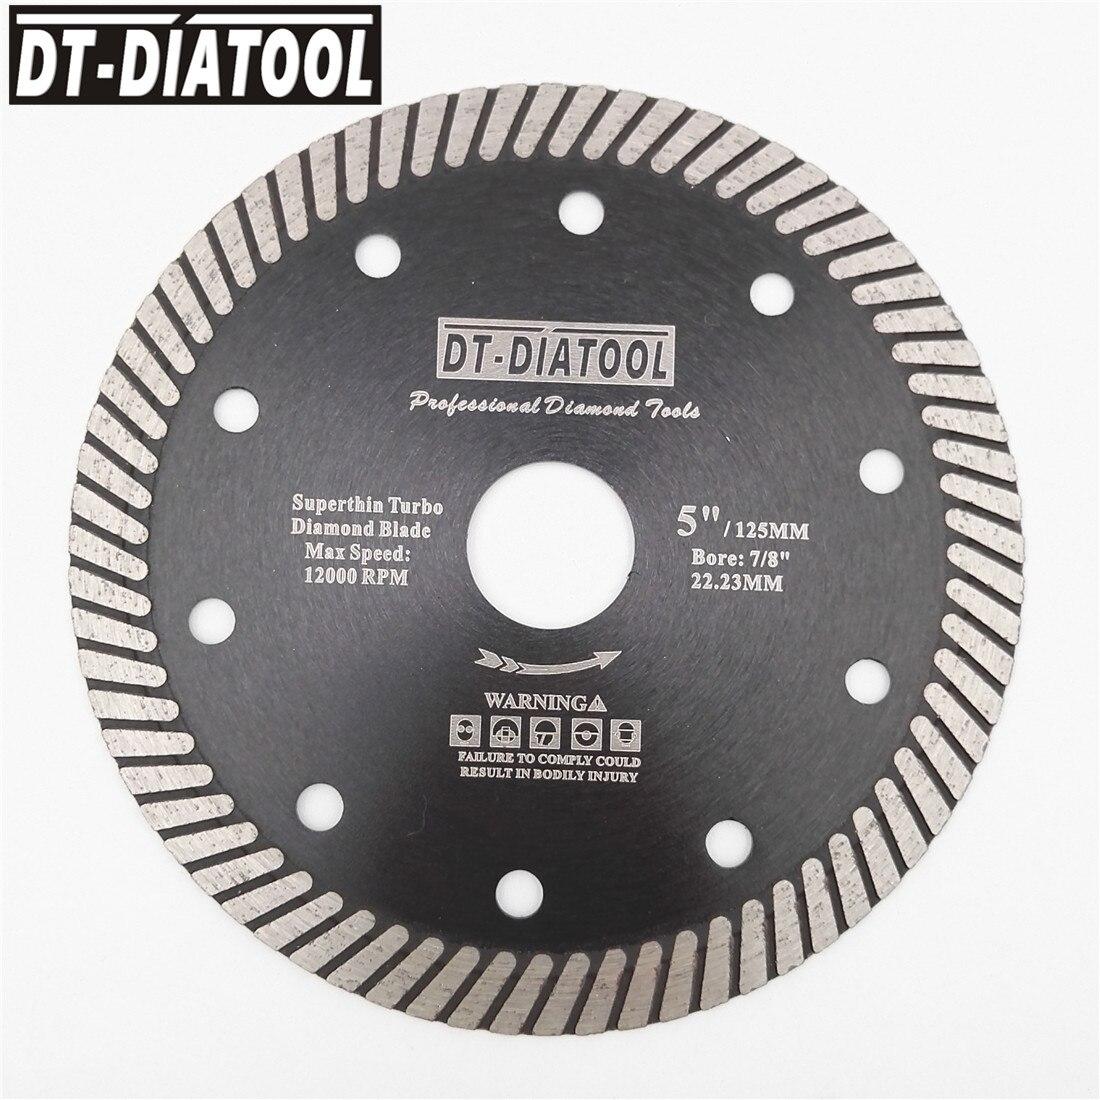 DT DIATOOL 10units Superthin Turbo Diamond Blade Hot Pressed Cutting Disc Hard Material Ceramic Tile Granite Diameter 4 quot 4 5 quot 5 quot in Saw Blades from Tools